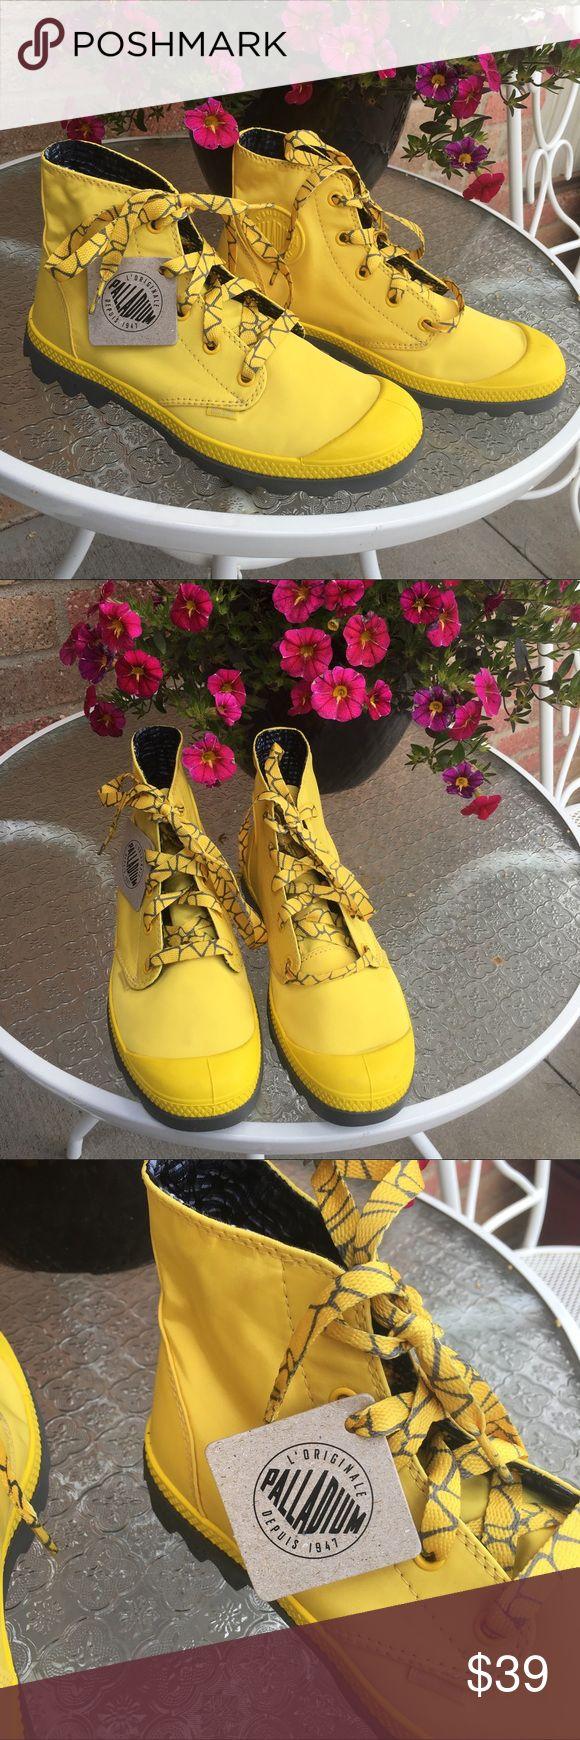 Amazing Palladium Flex Lace M Women Textile Yellow Sneakers Athletic